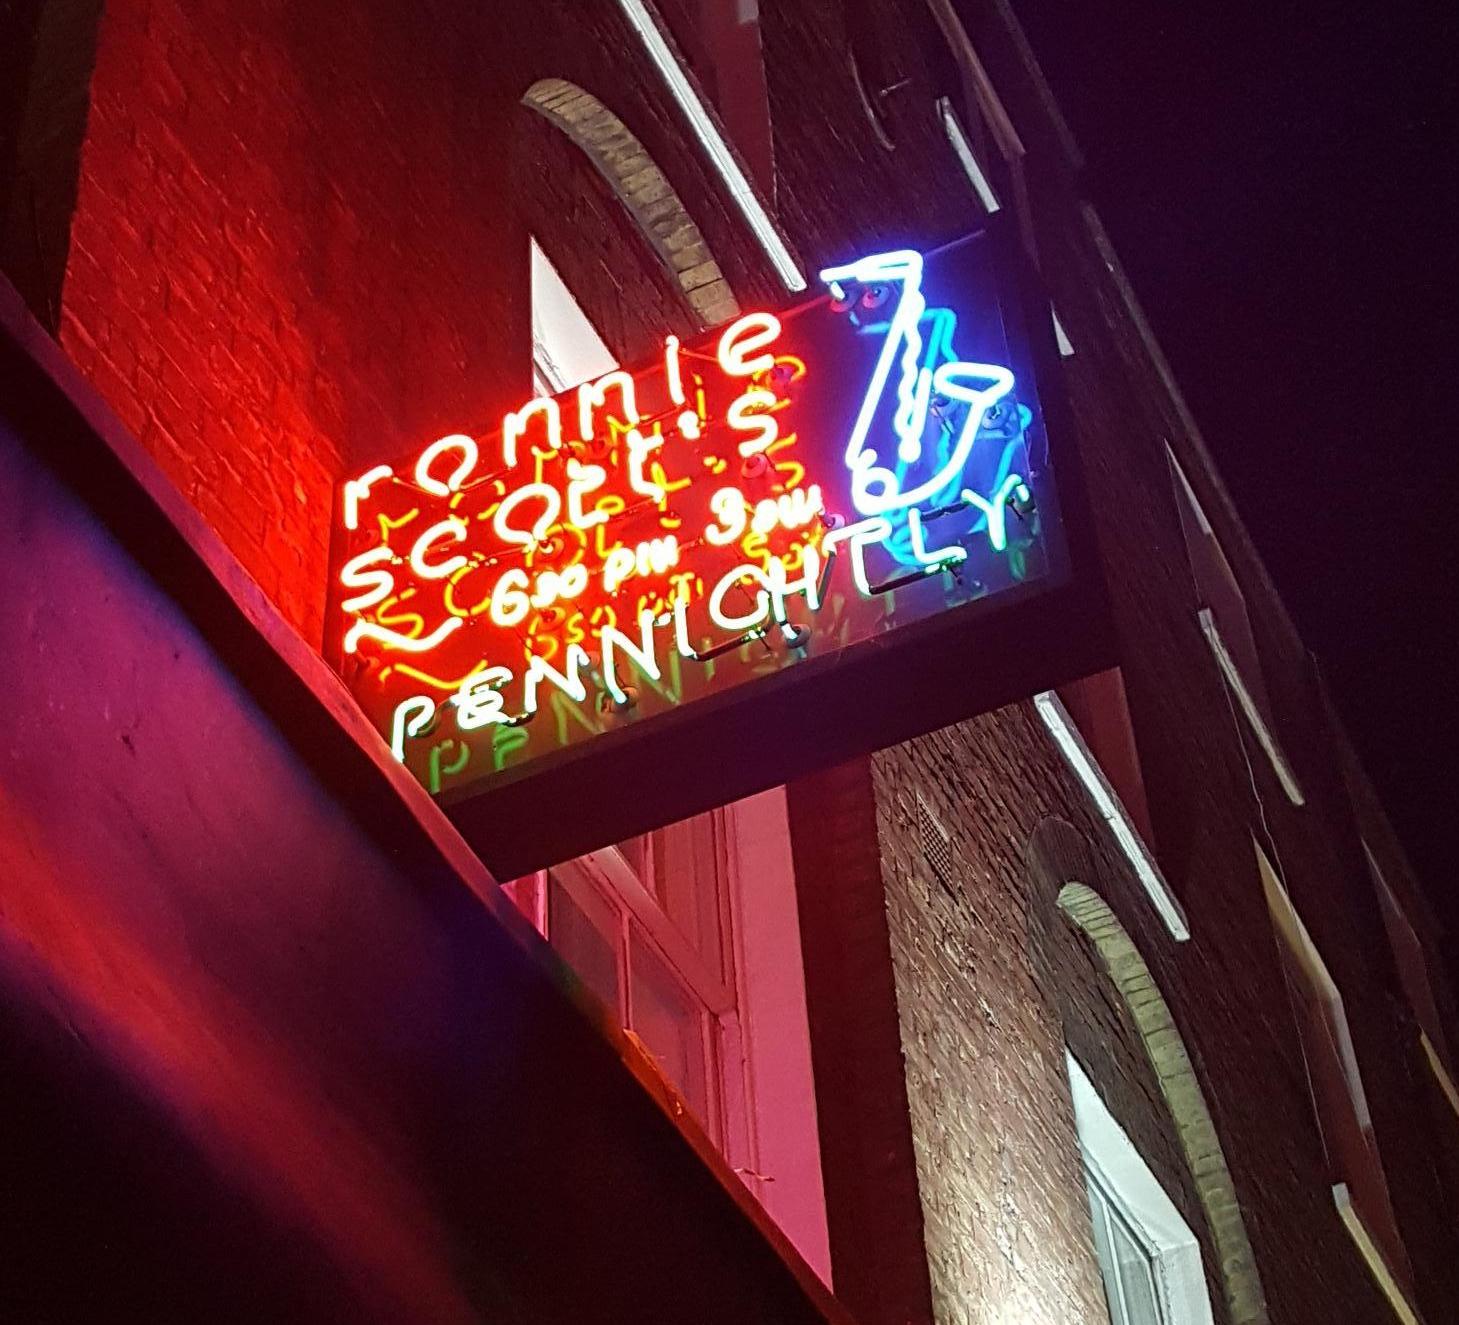 20180406_Ronnie Neon